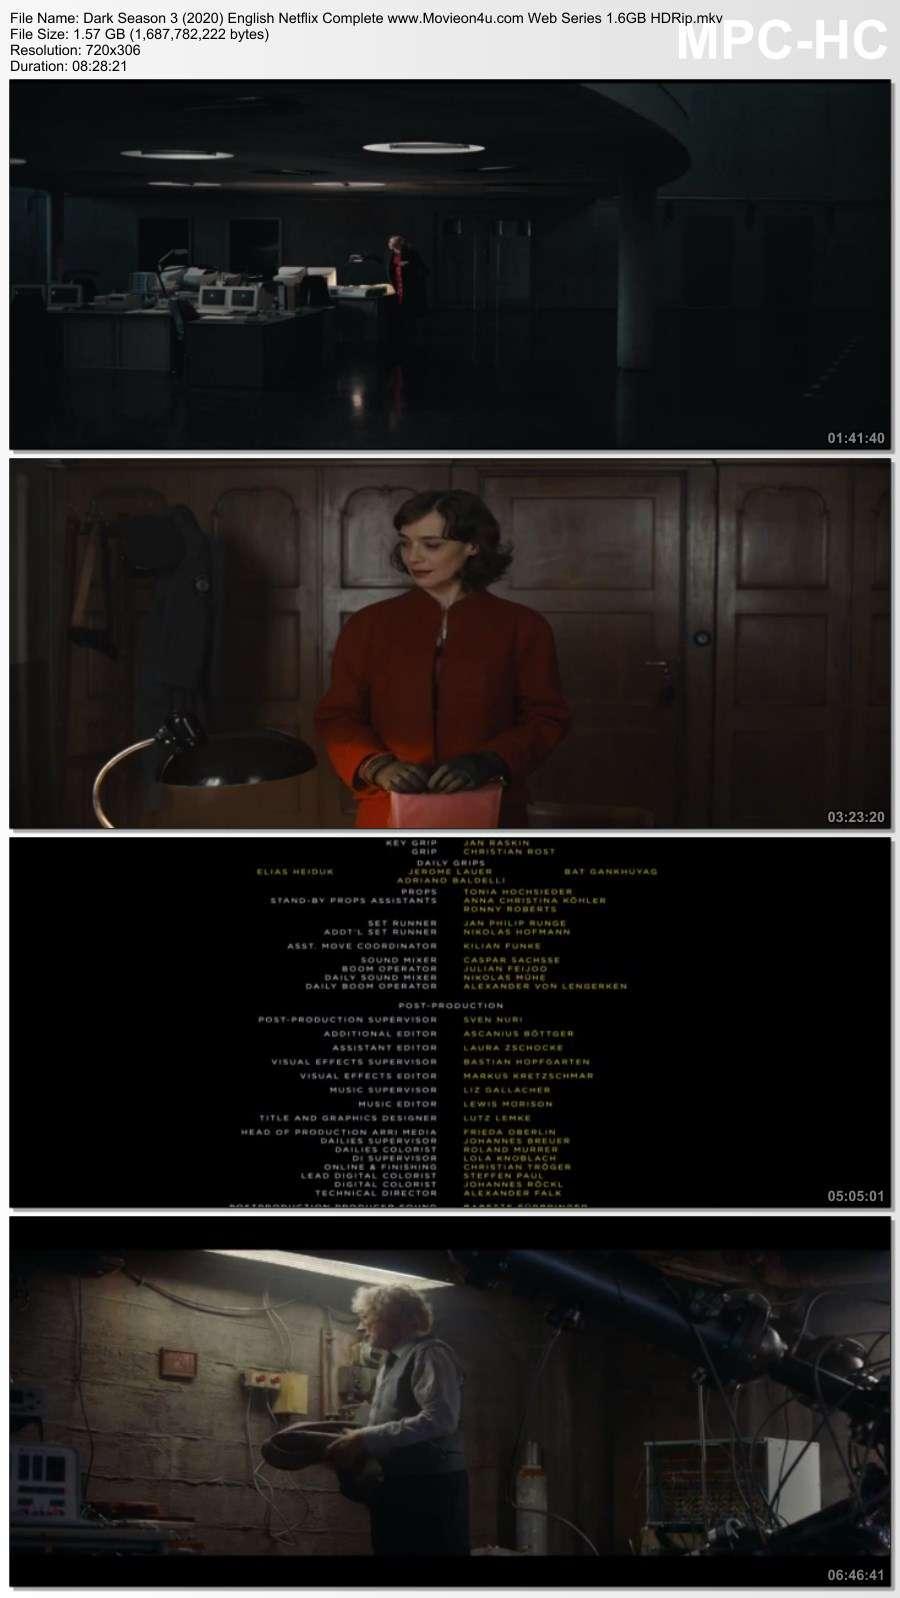 Dark Season 3 (2020) English Netflix Complete Web Series 1.6GB HDRip x264 480p Download HD